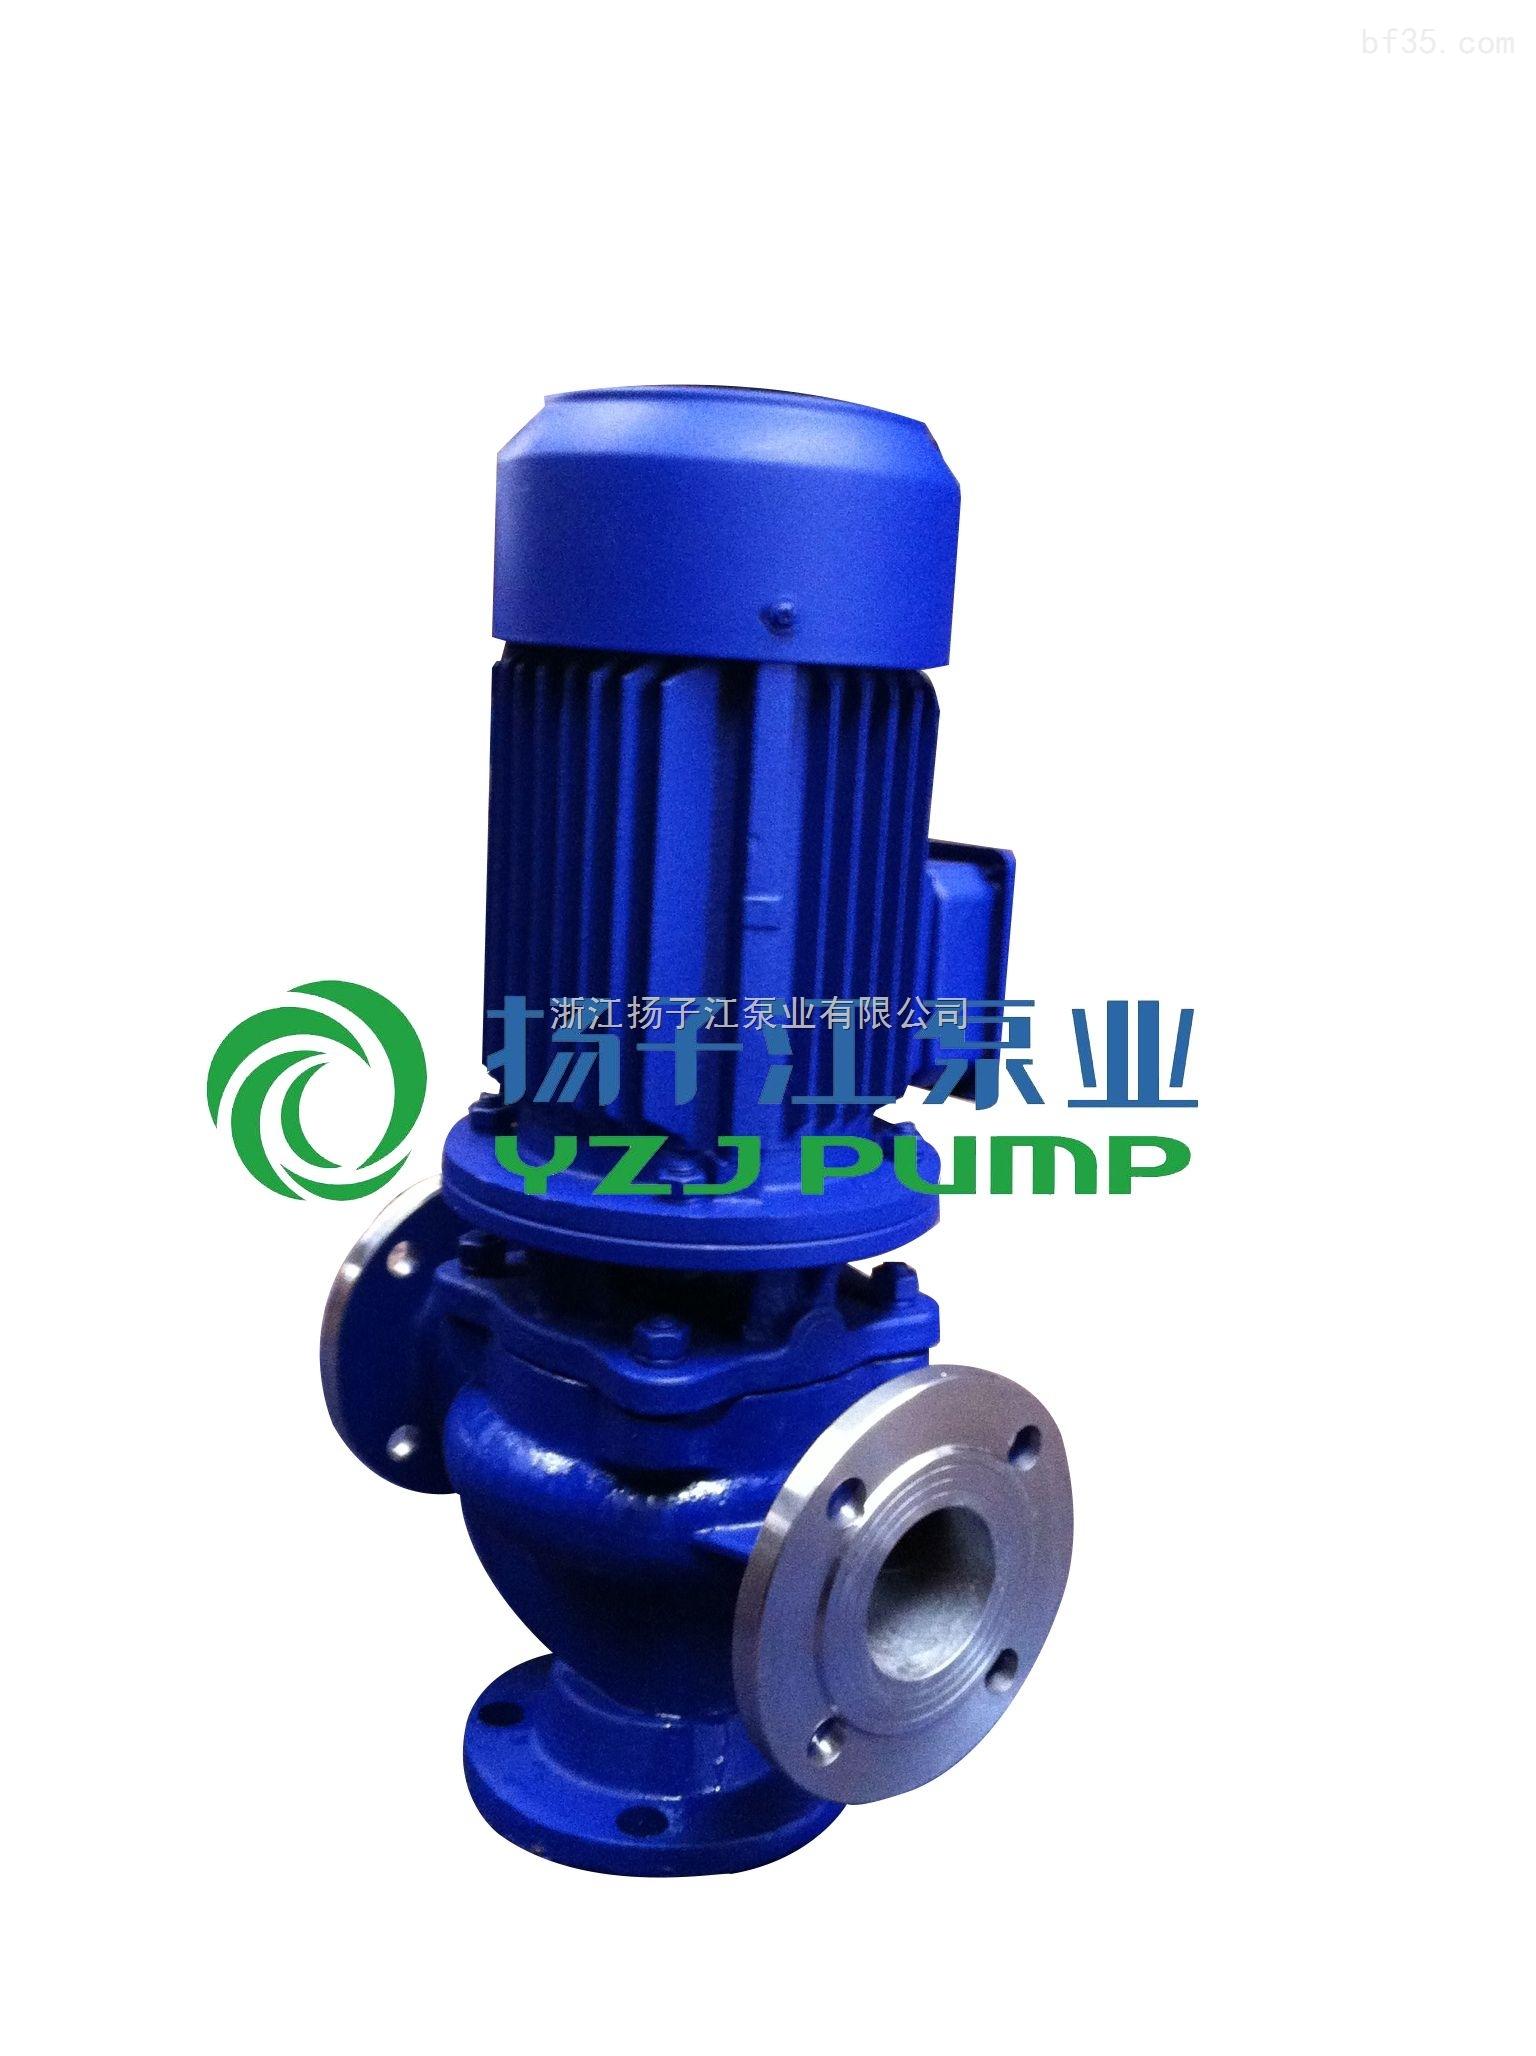 GWP不锈钢排污泵 304 316LGW型管道式排污泵 不锈钢管道排污泵 防爆管道排污泵